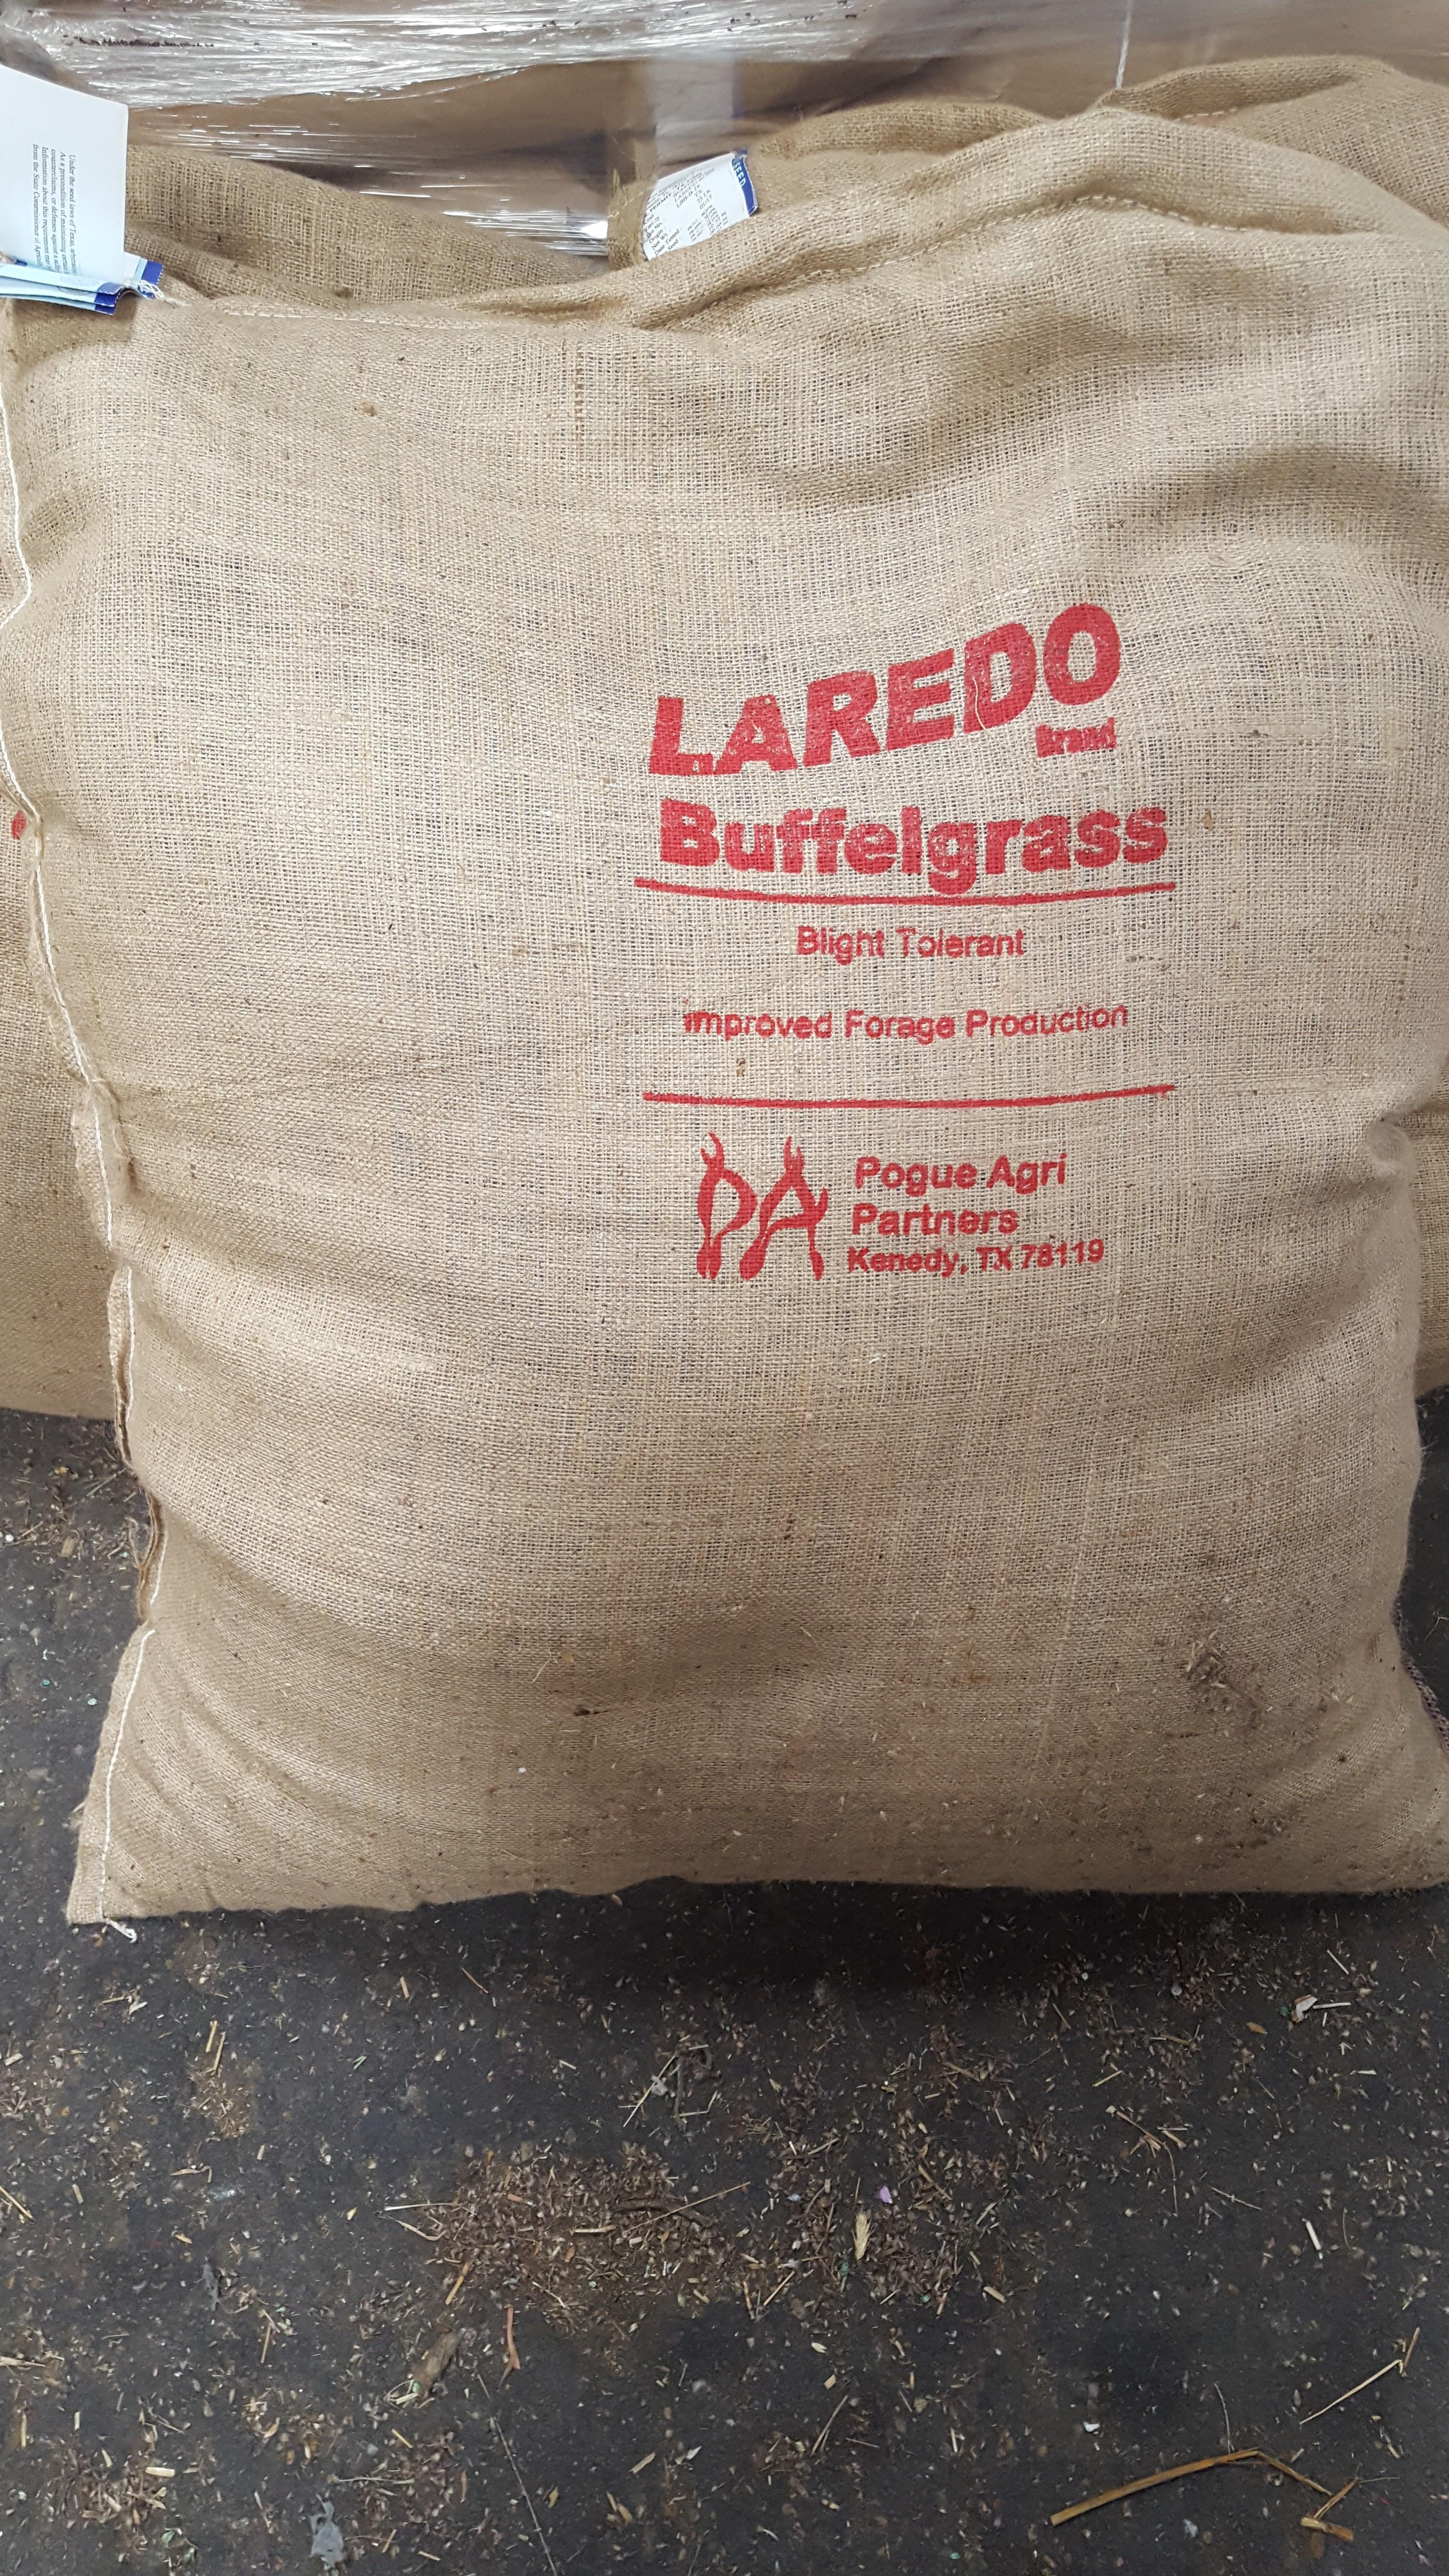 Laredo Buffel